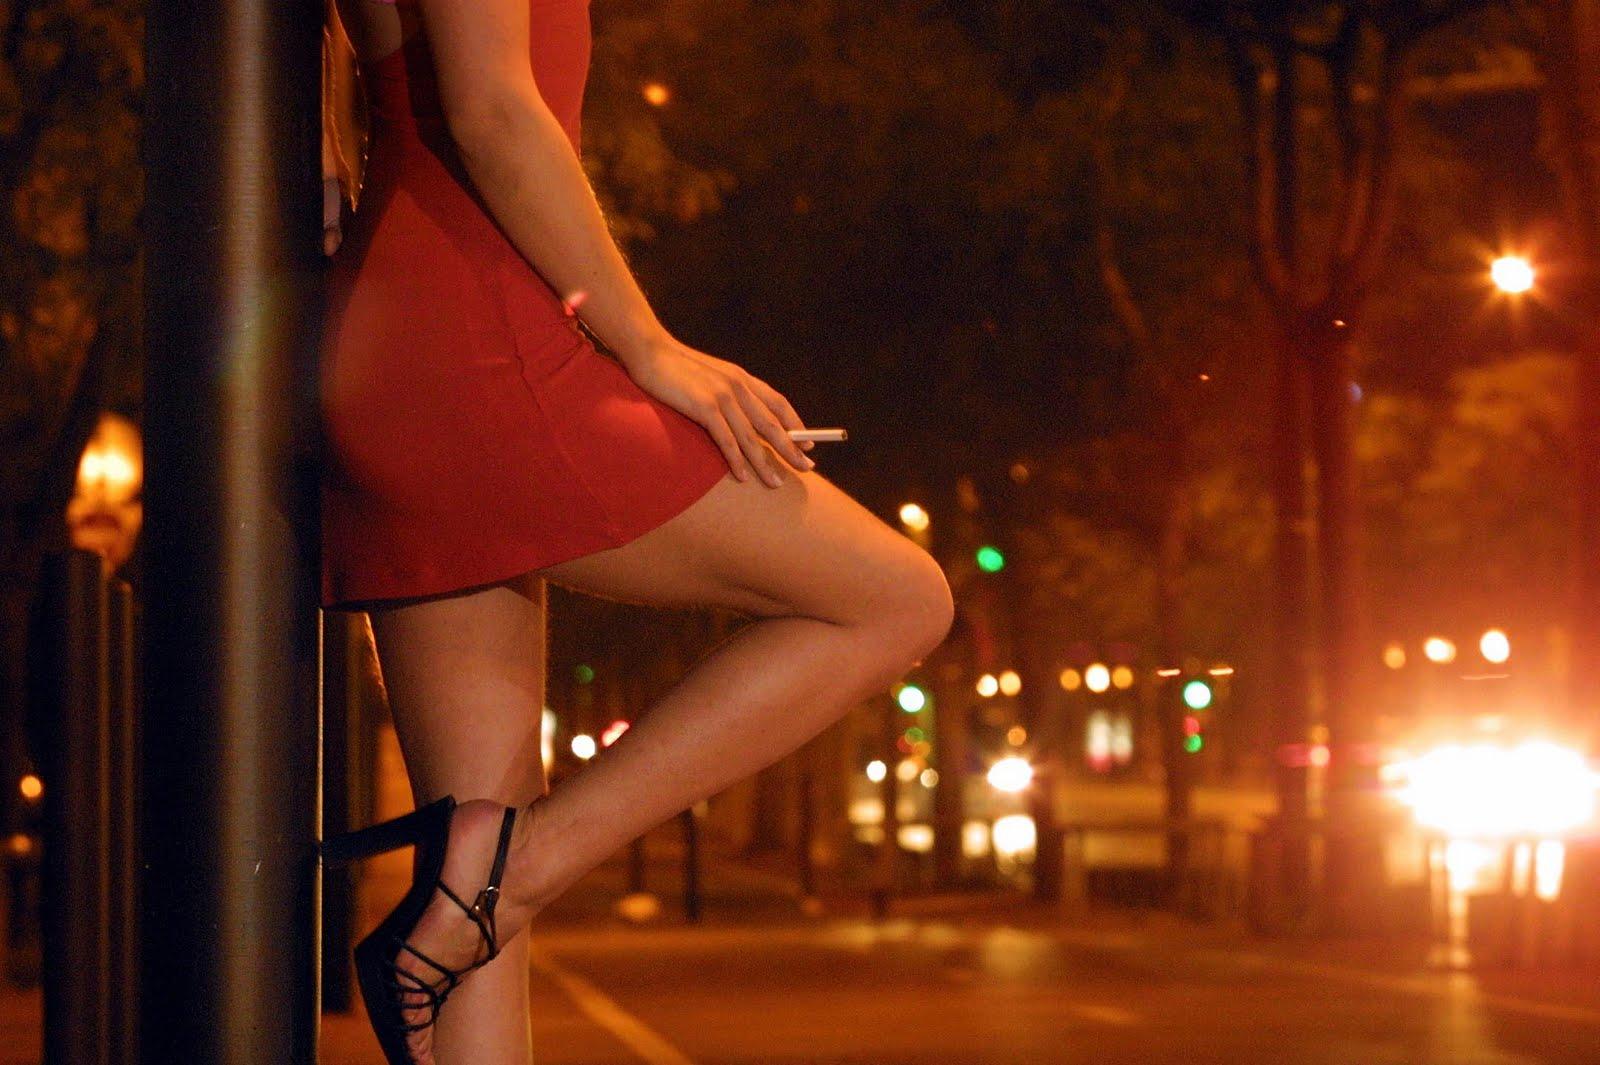 prostitution danmark bliver nordens bordel